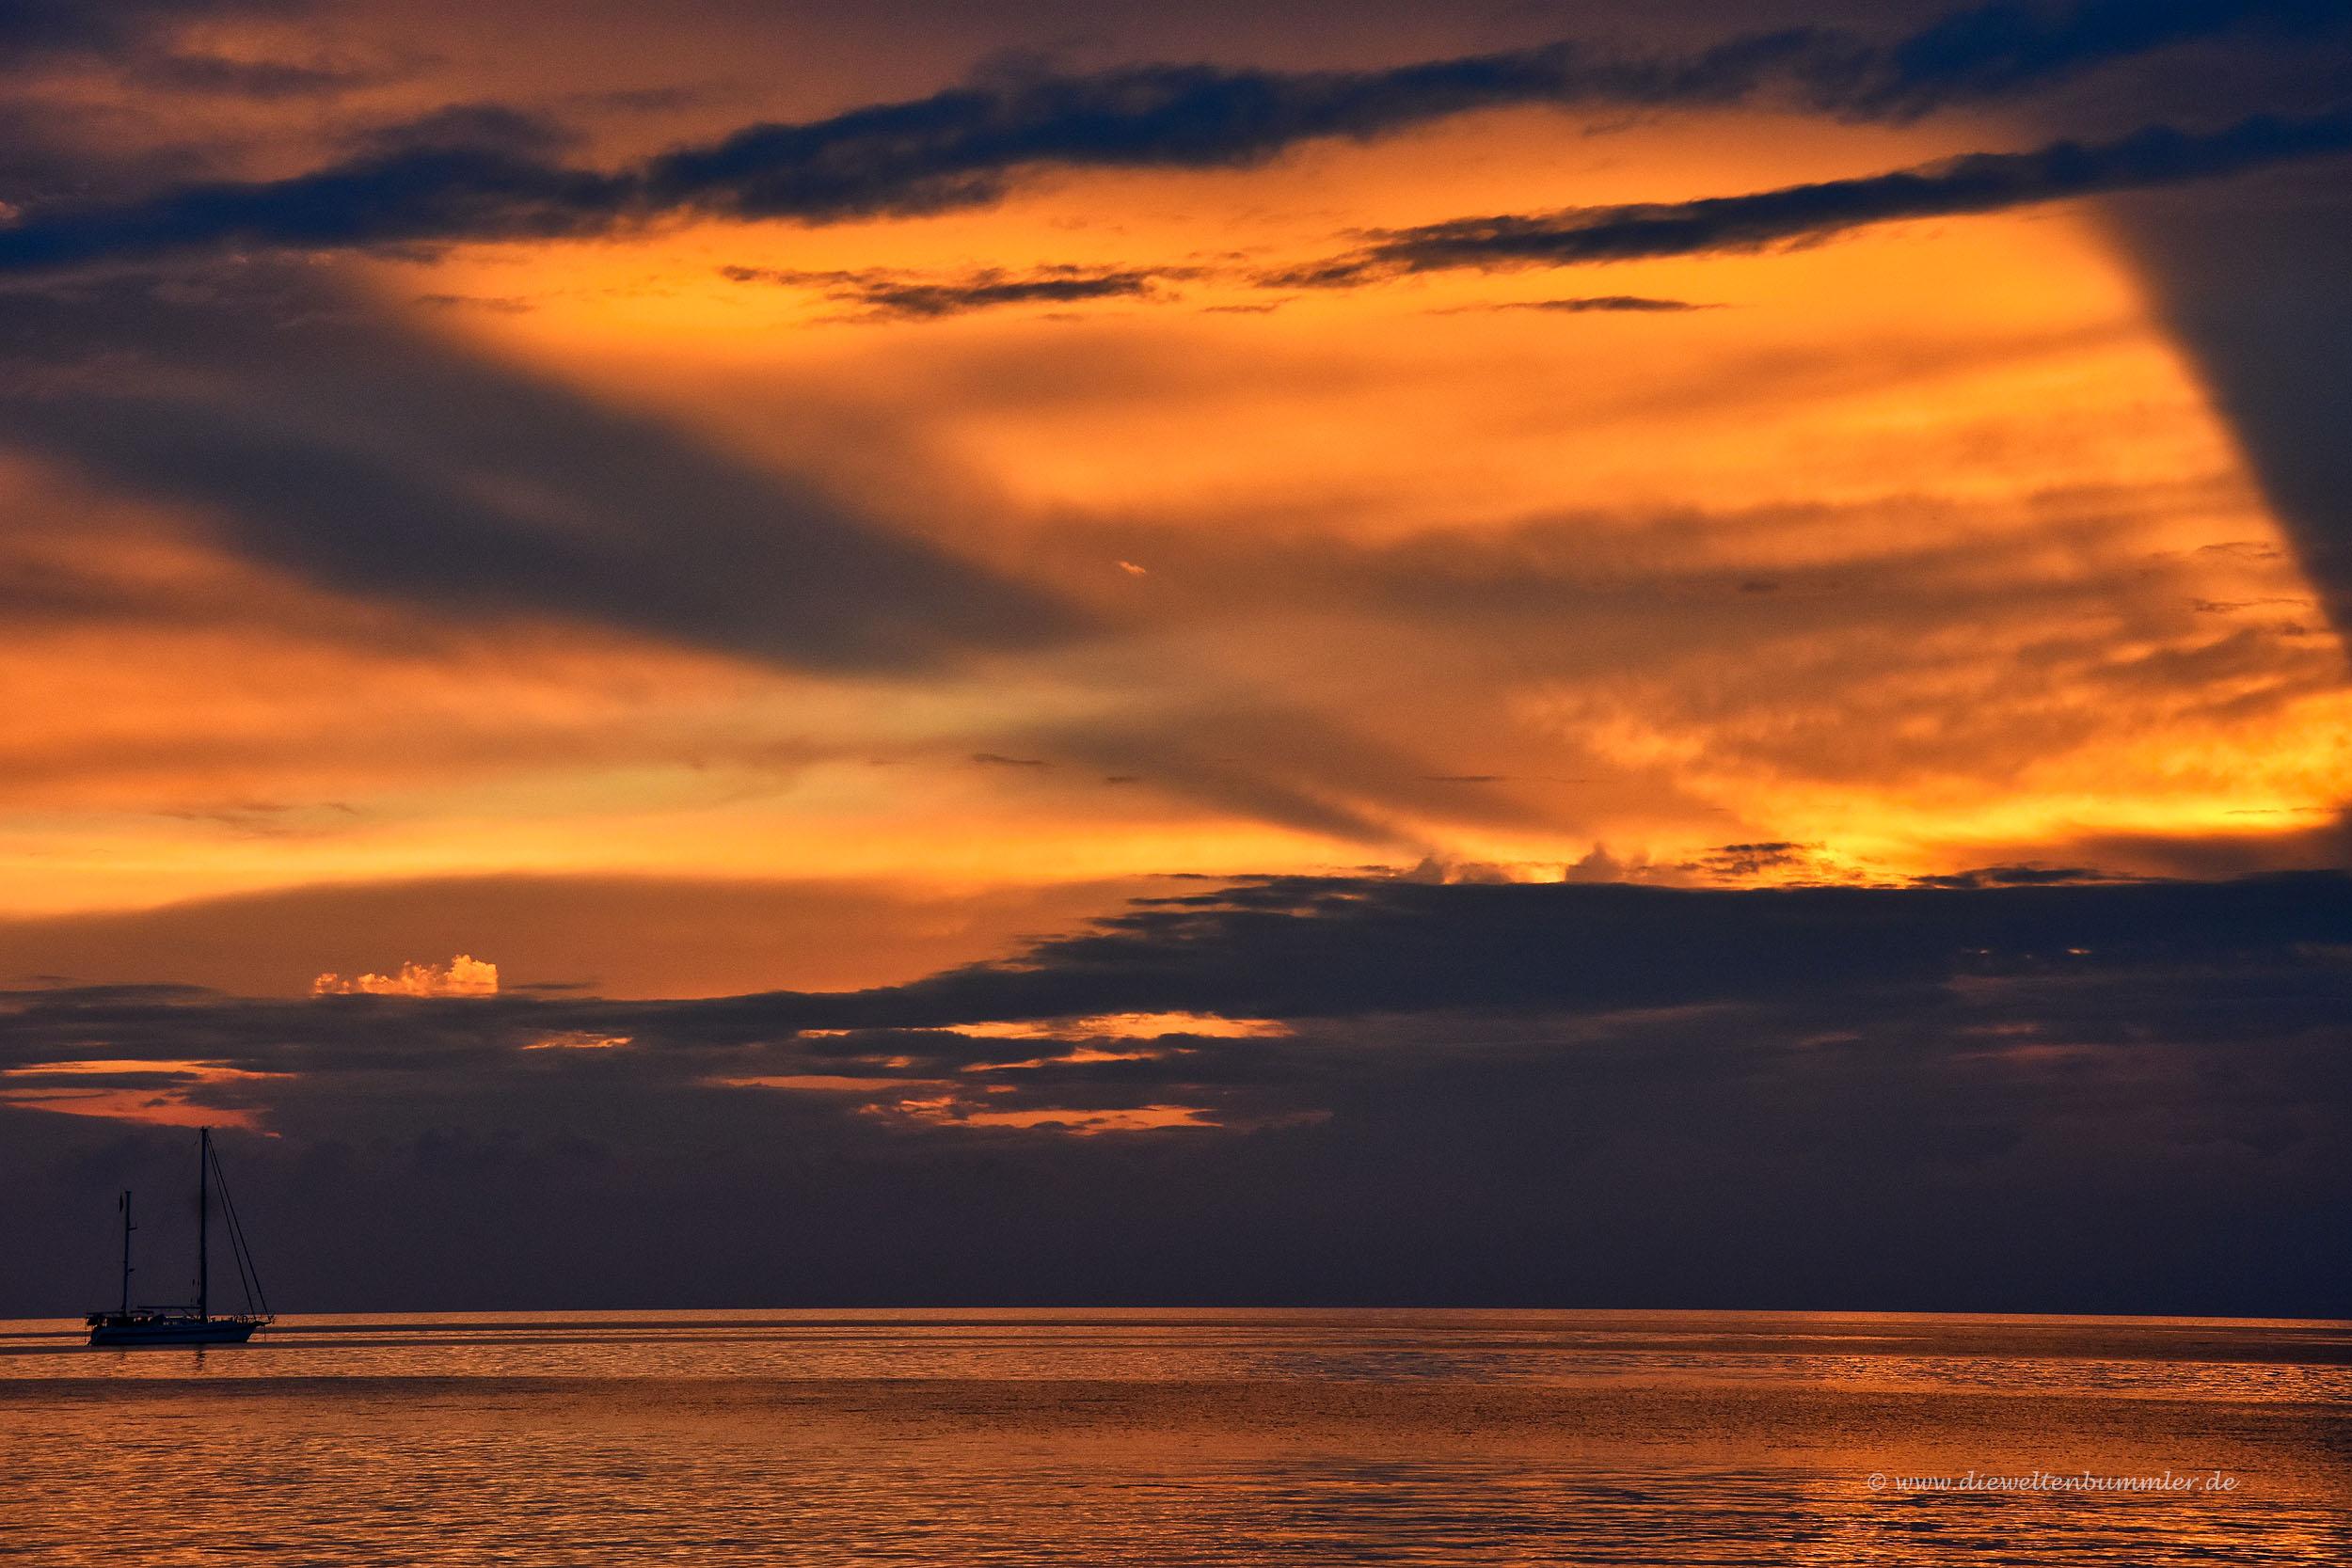 Sonnenuntergang bei Portorož